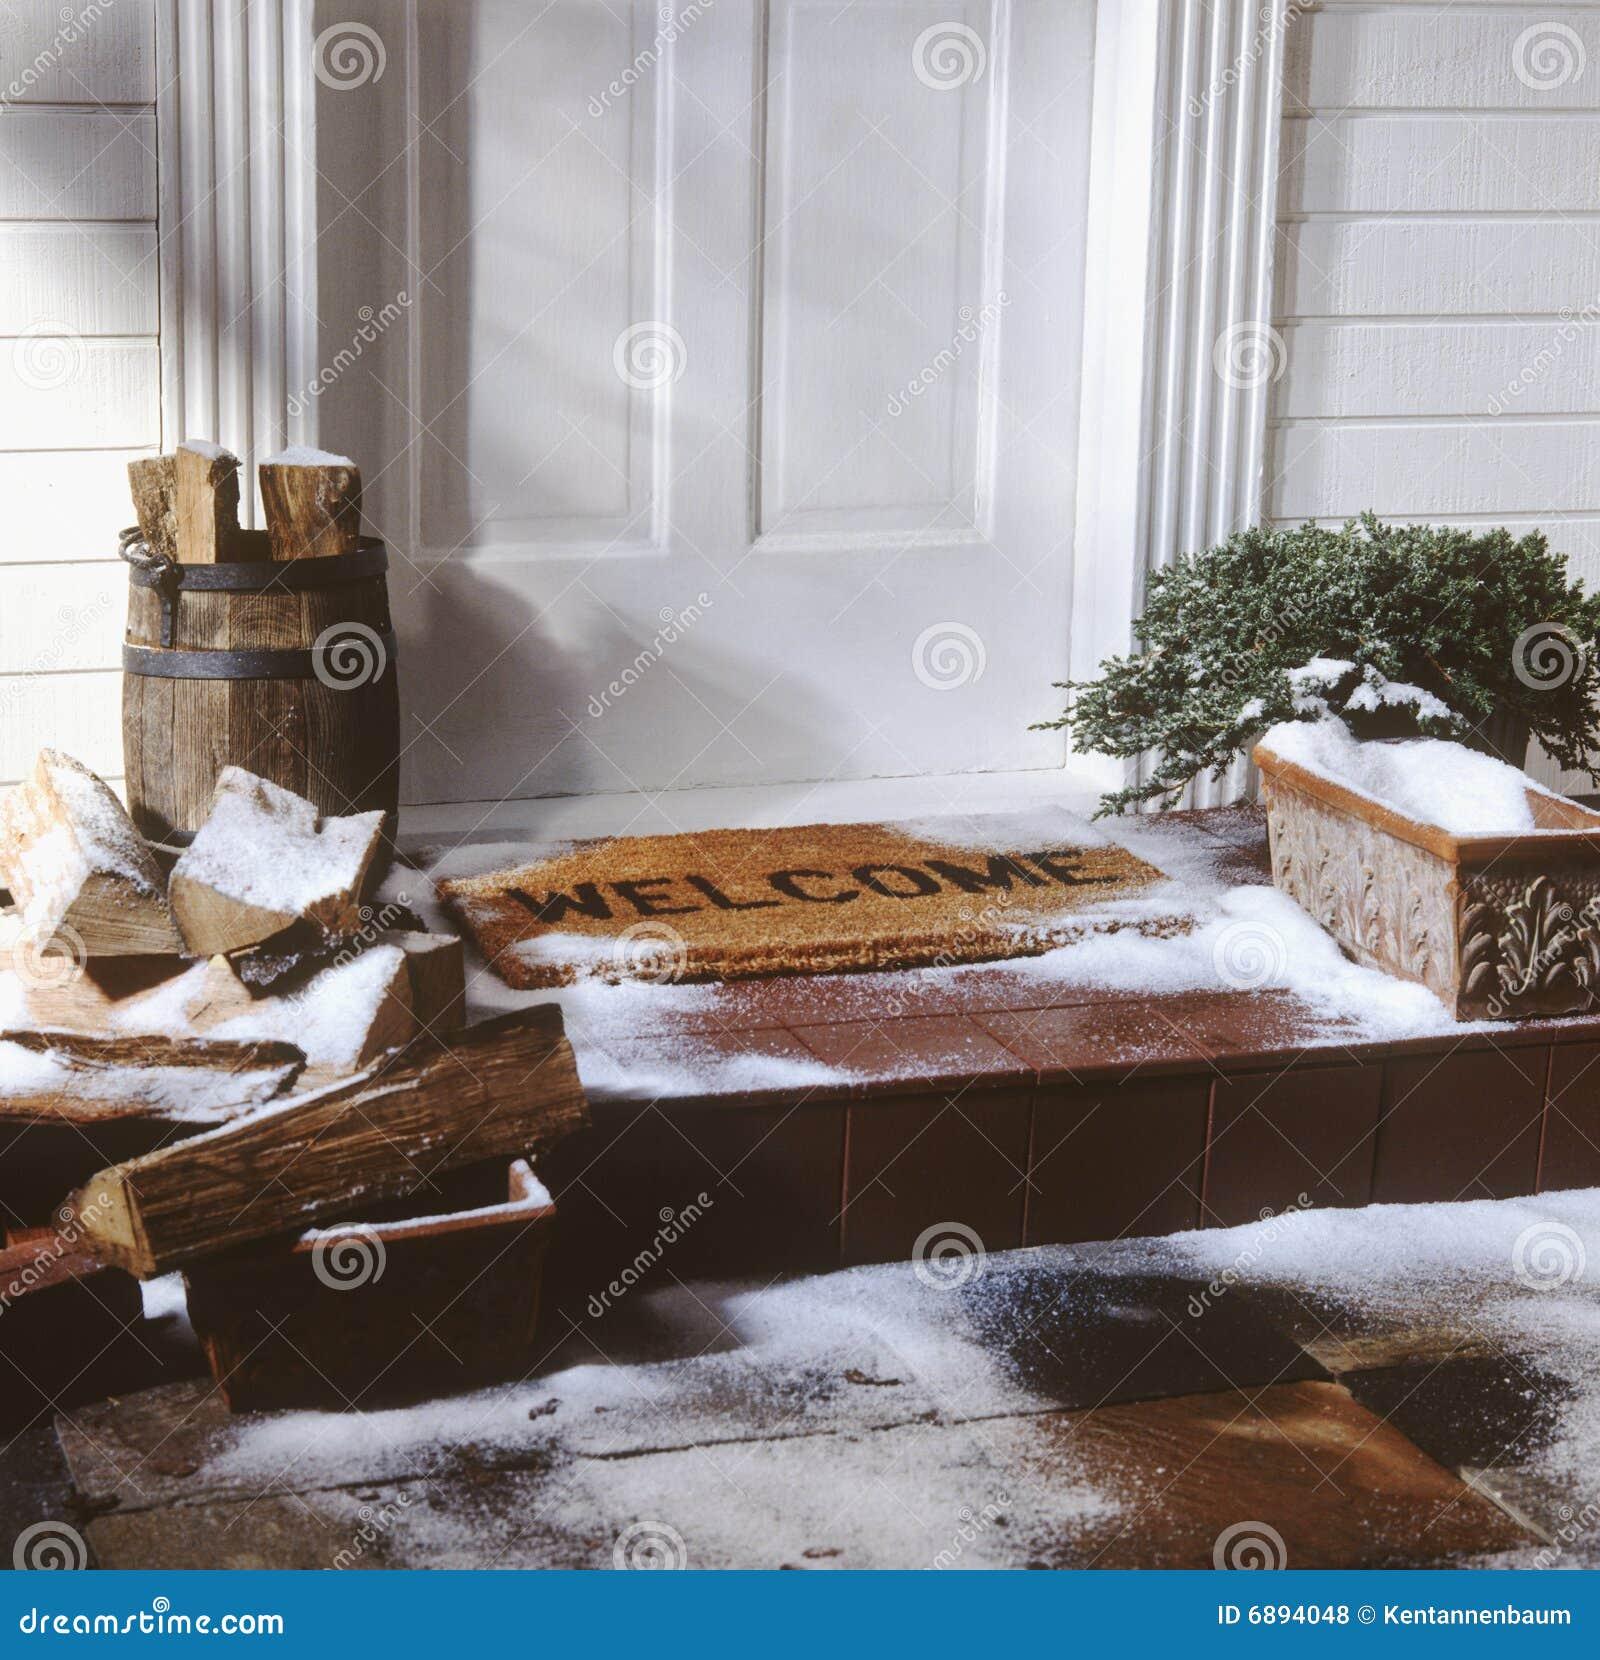 Door of house with welcome mat in winter Royalty Free Stock Photos & Front Door Welcome Mat Stock Photo - Image: 8132160 Pezcame.Com